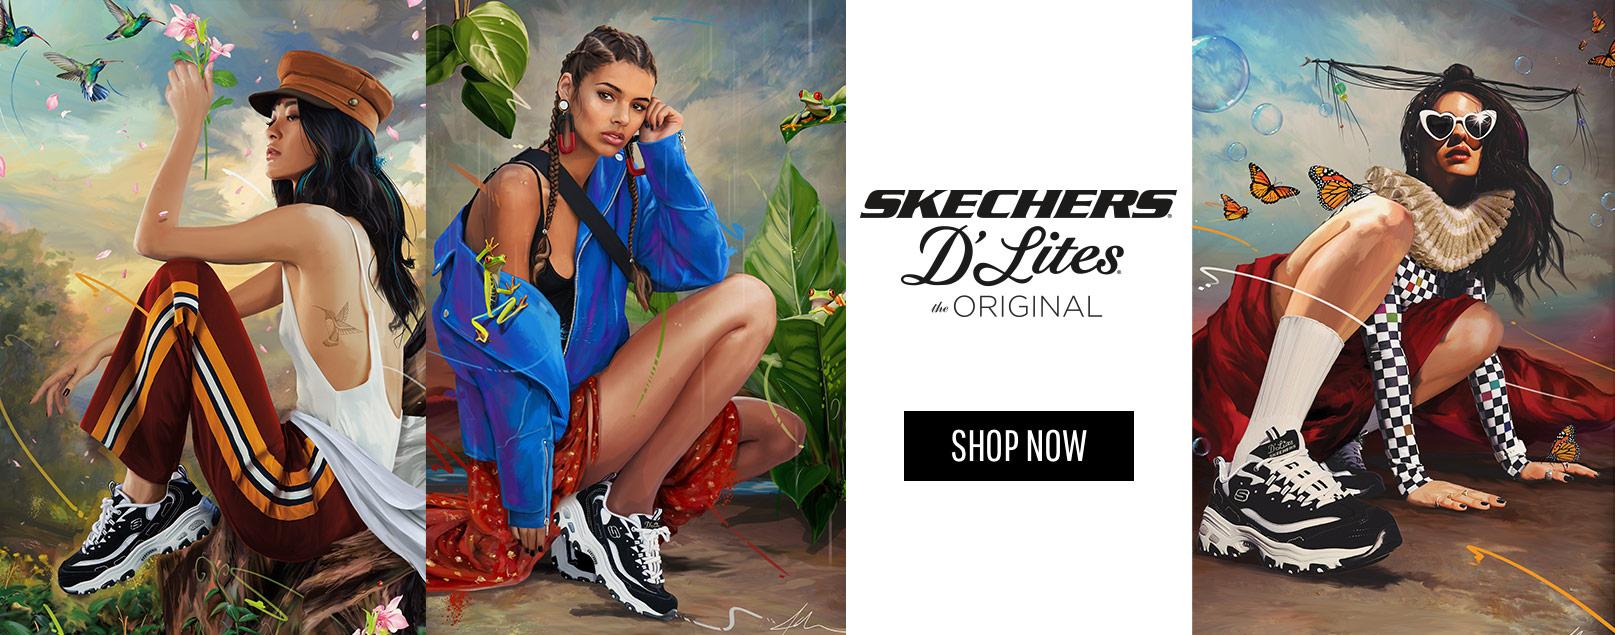 Shop Skechers D'Lites